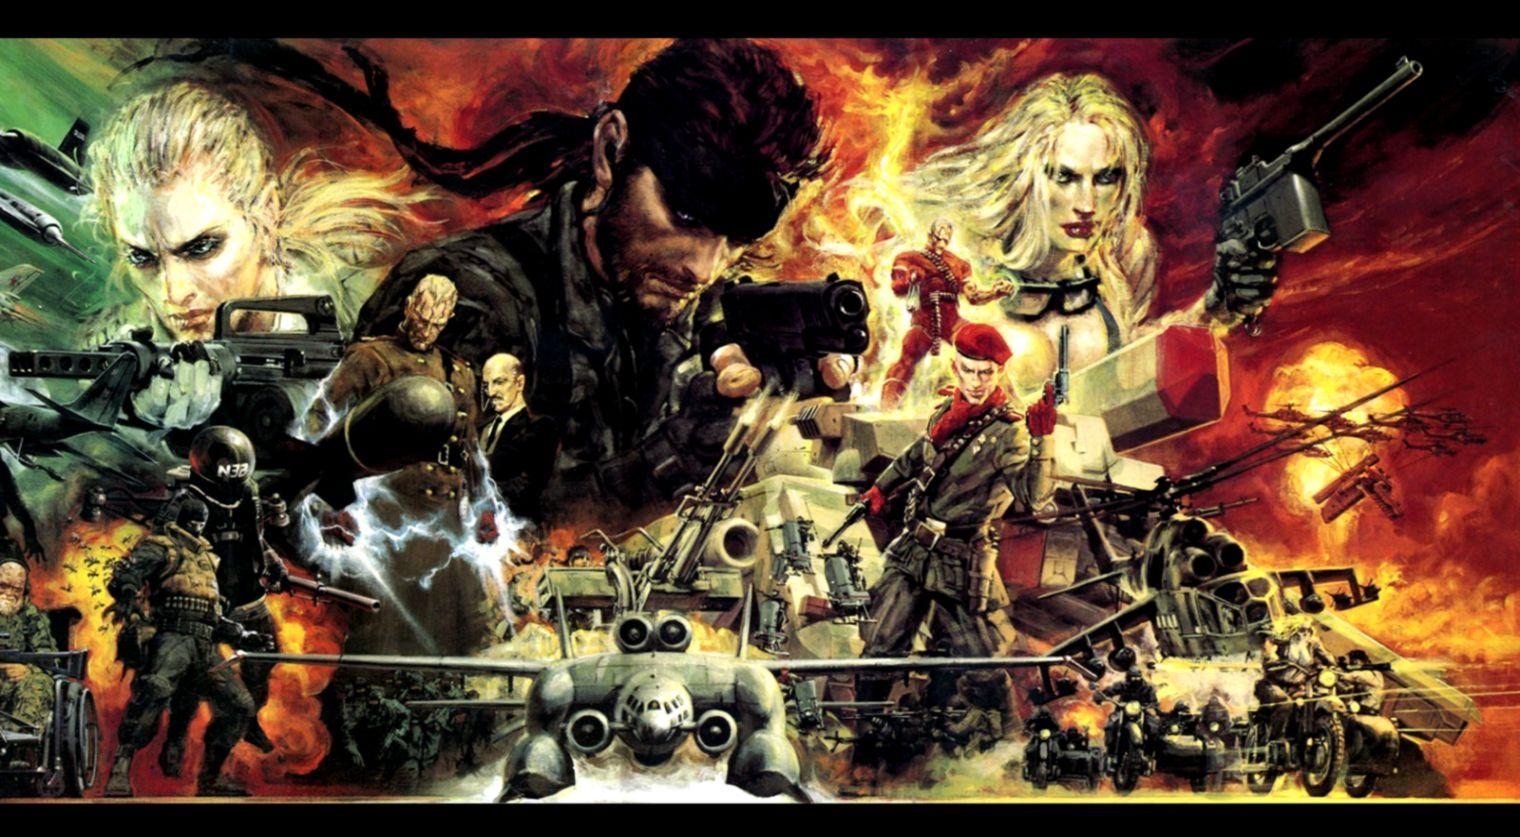 Metal Gear Solid 5 Hq Wallpaper Widescreen Wallpapers For Fun